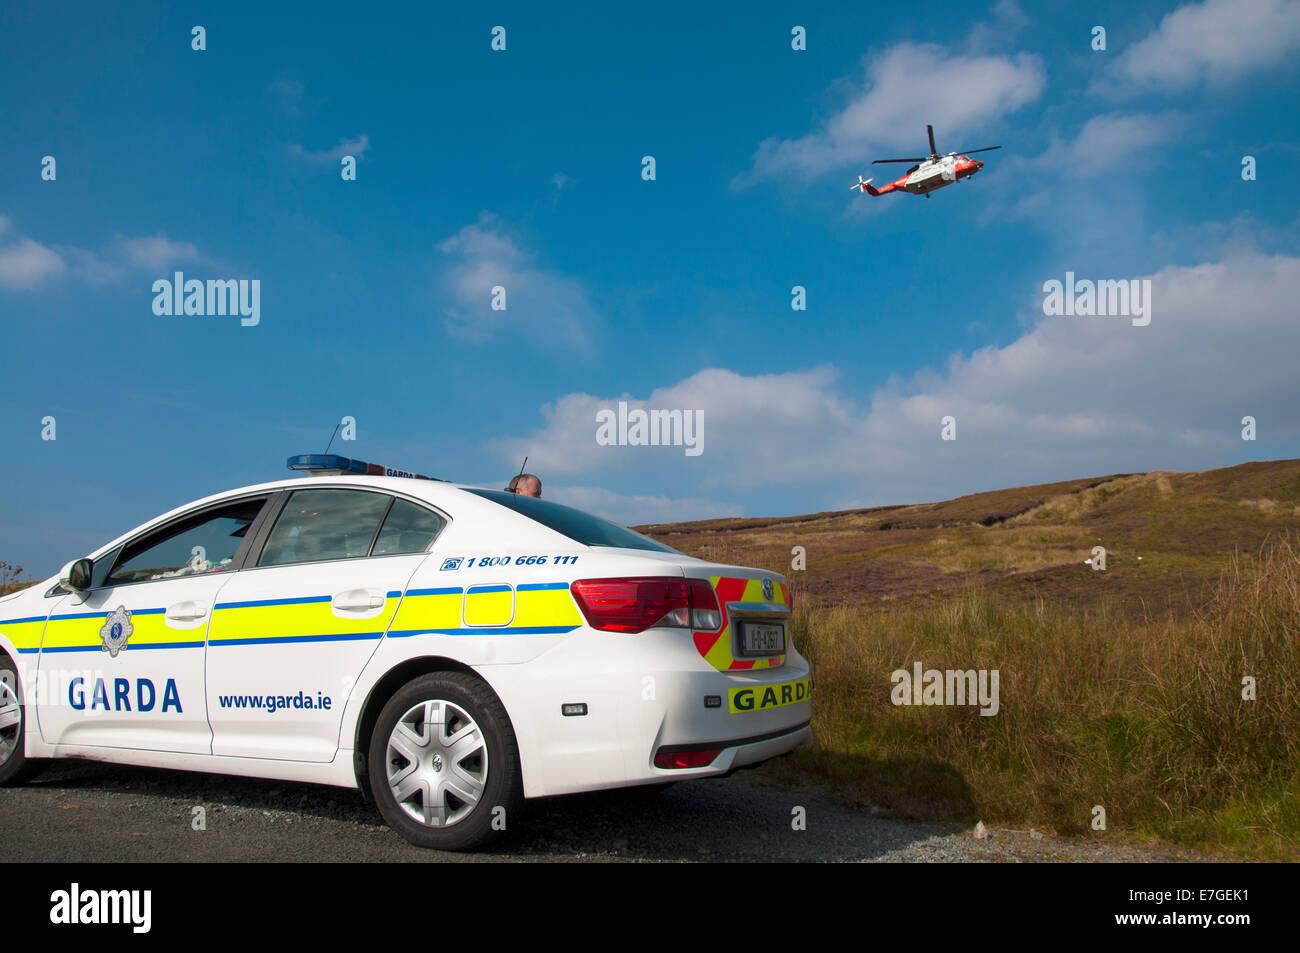 Irish Coast Guard IRCG  Garda Cósta na hÉireann Sikorsky helicopter flies above an Irish police car during a medical Stock Photo